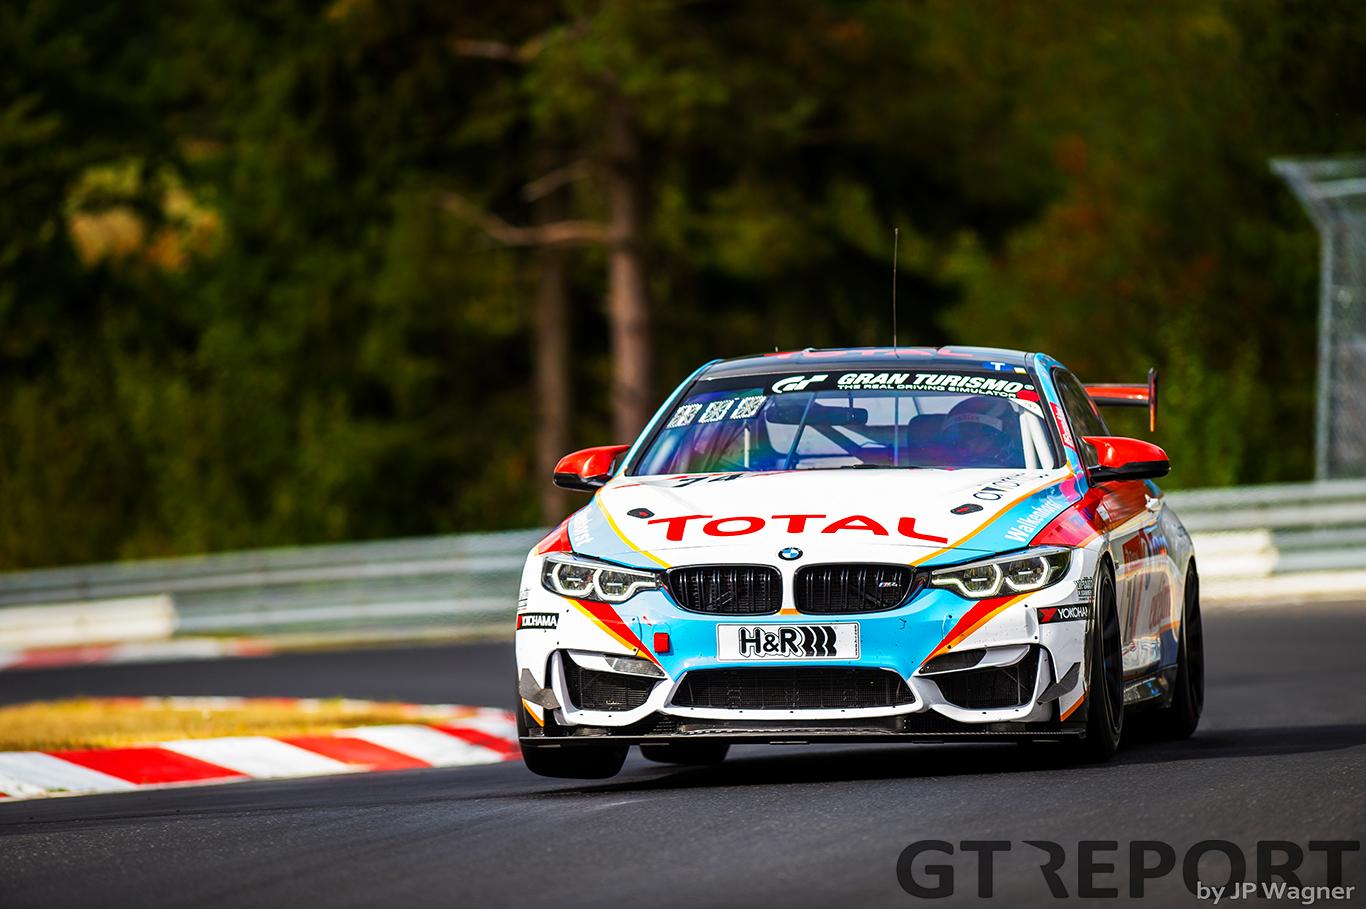 Nürburgring 24 Hours driver report: Ben Tuck – Qualifying